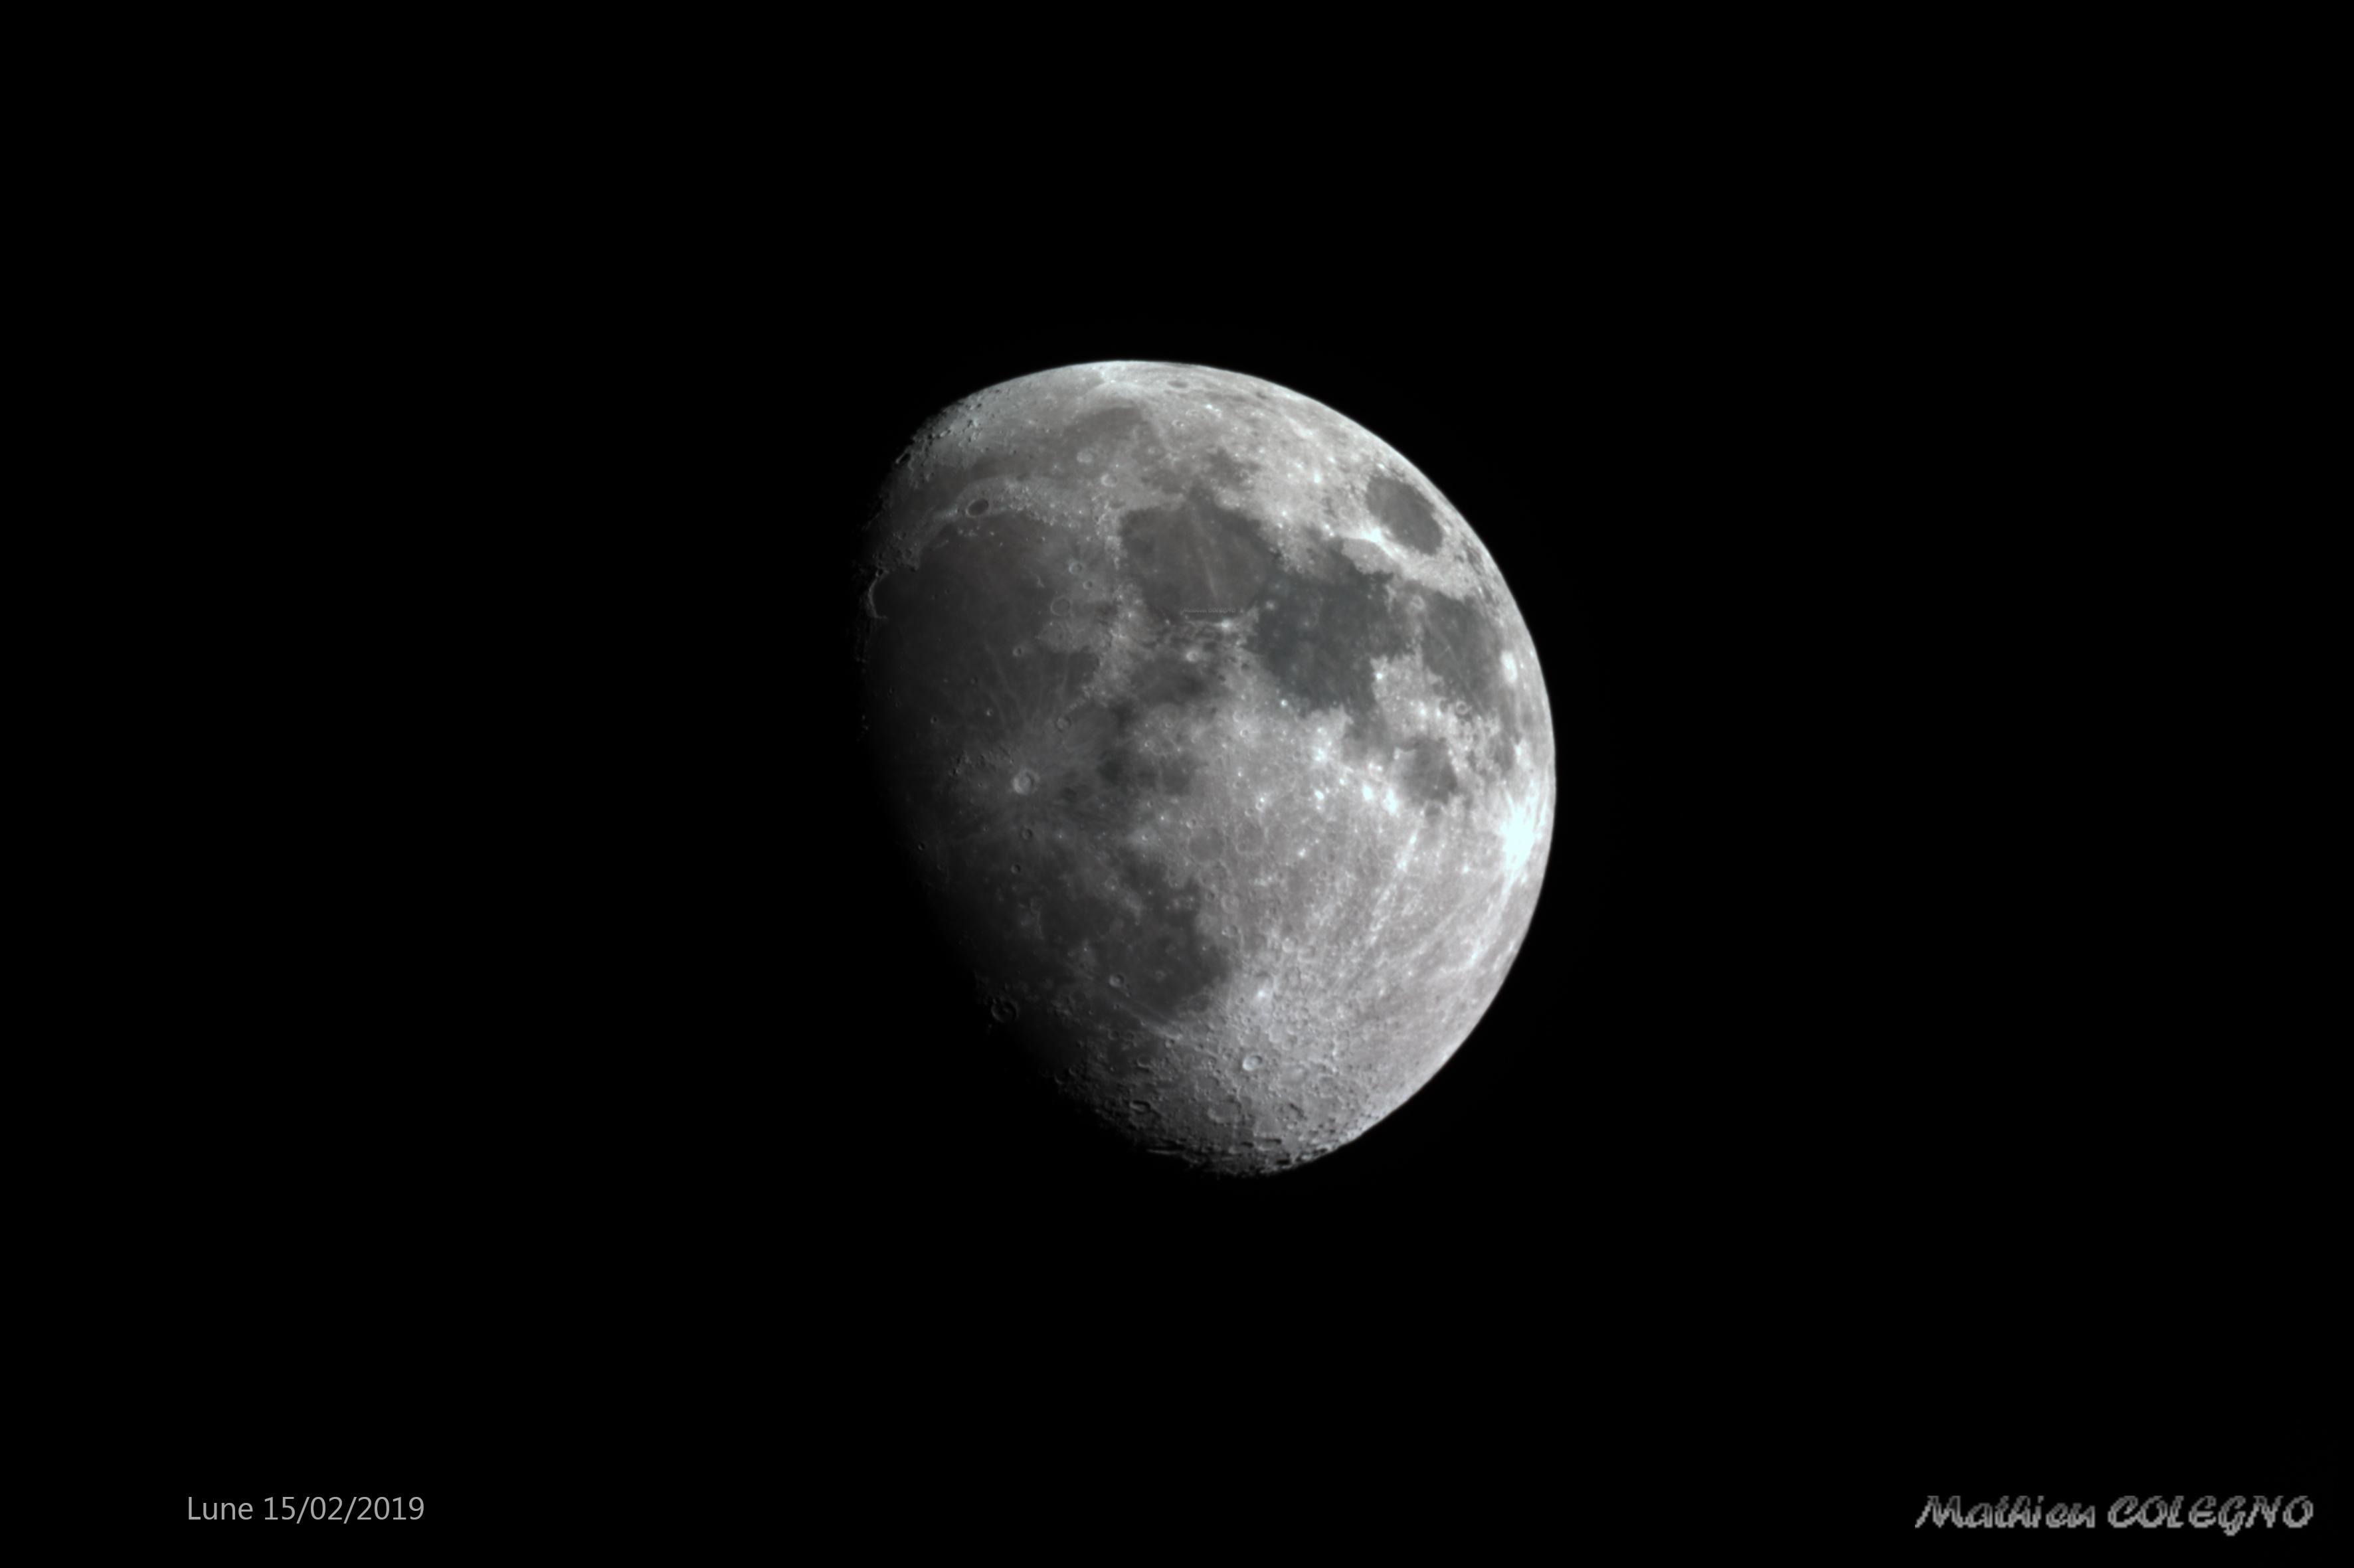 Lune 15022019